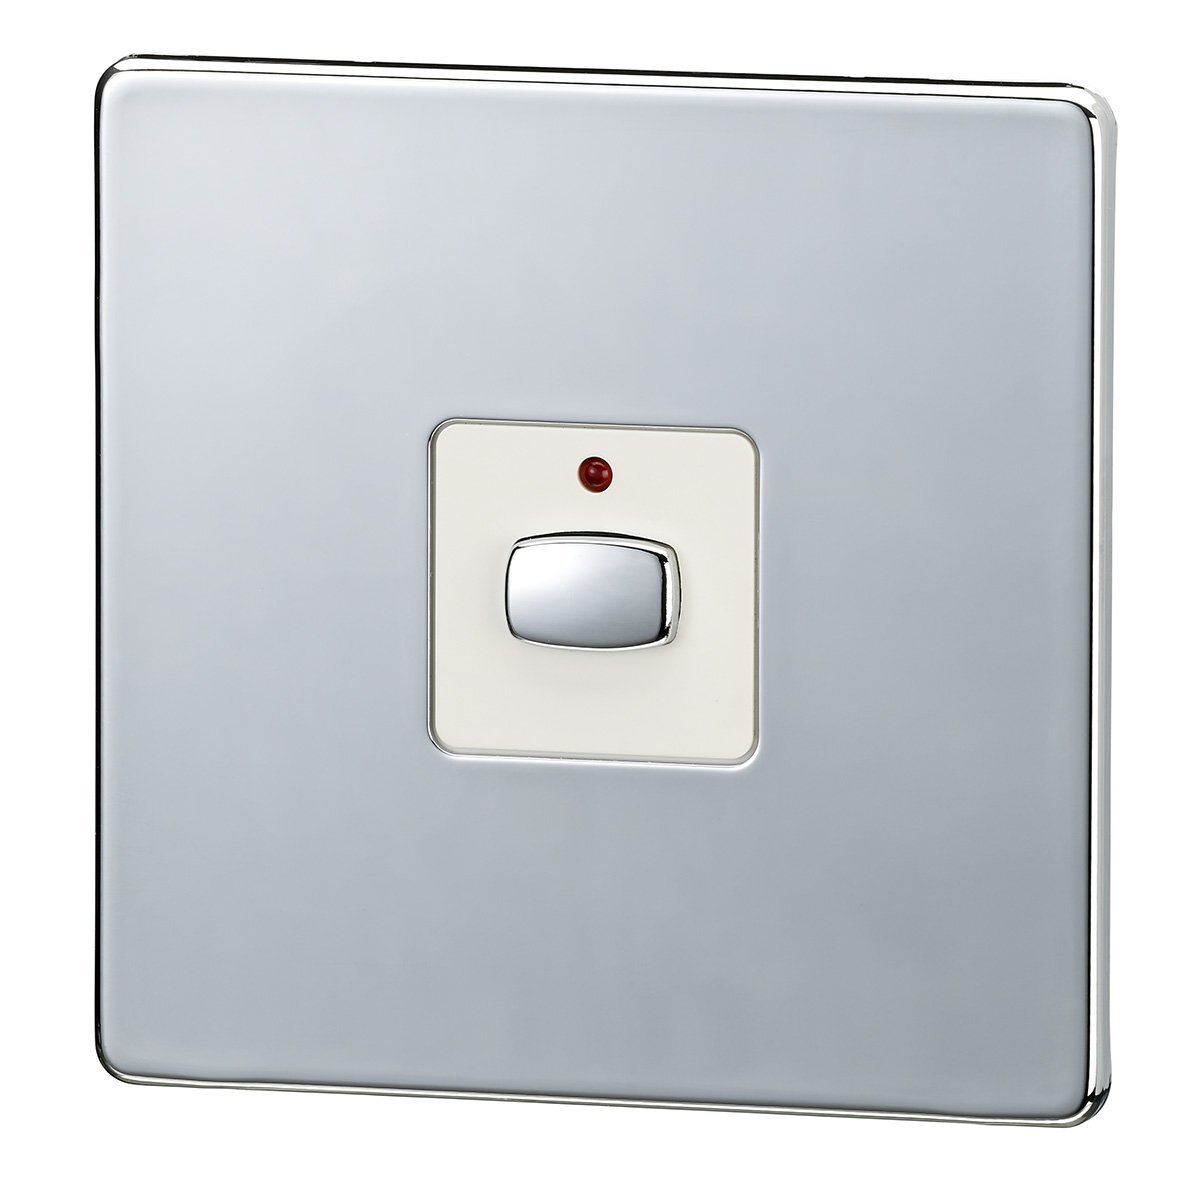 Energenie MIHO025 Mi|Home One Gang Light Switch - Chrome: Amazon.co ...